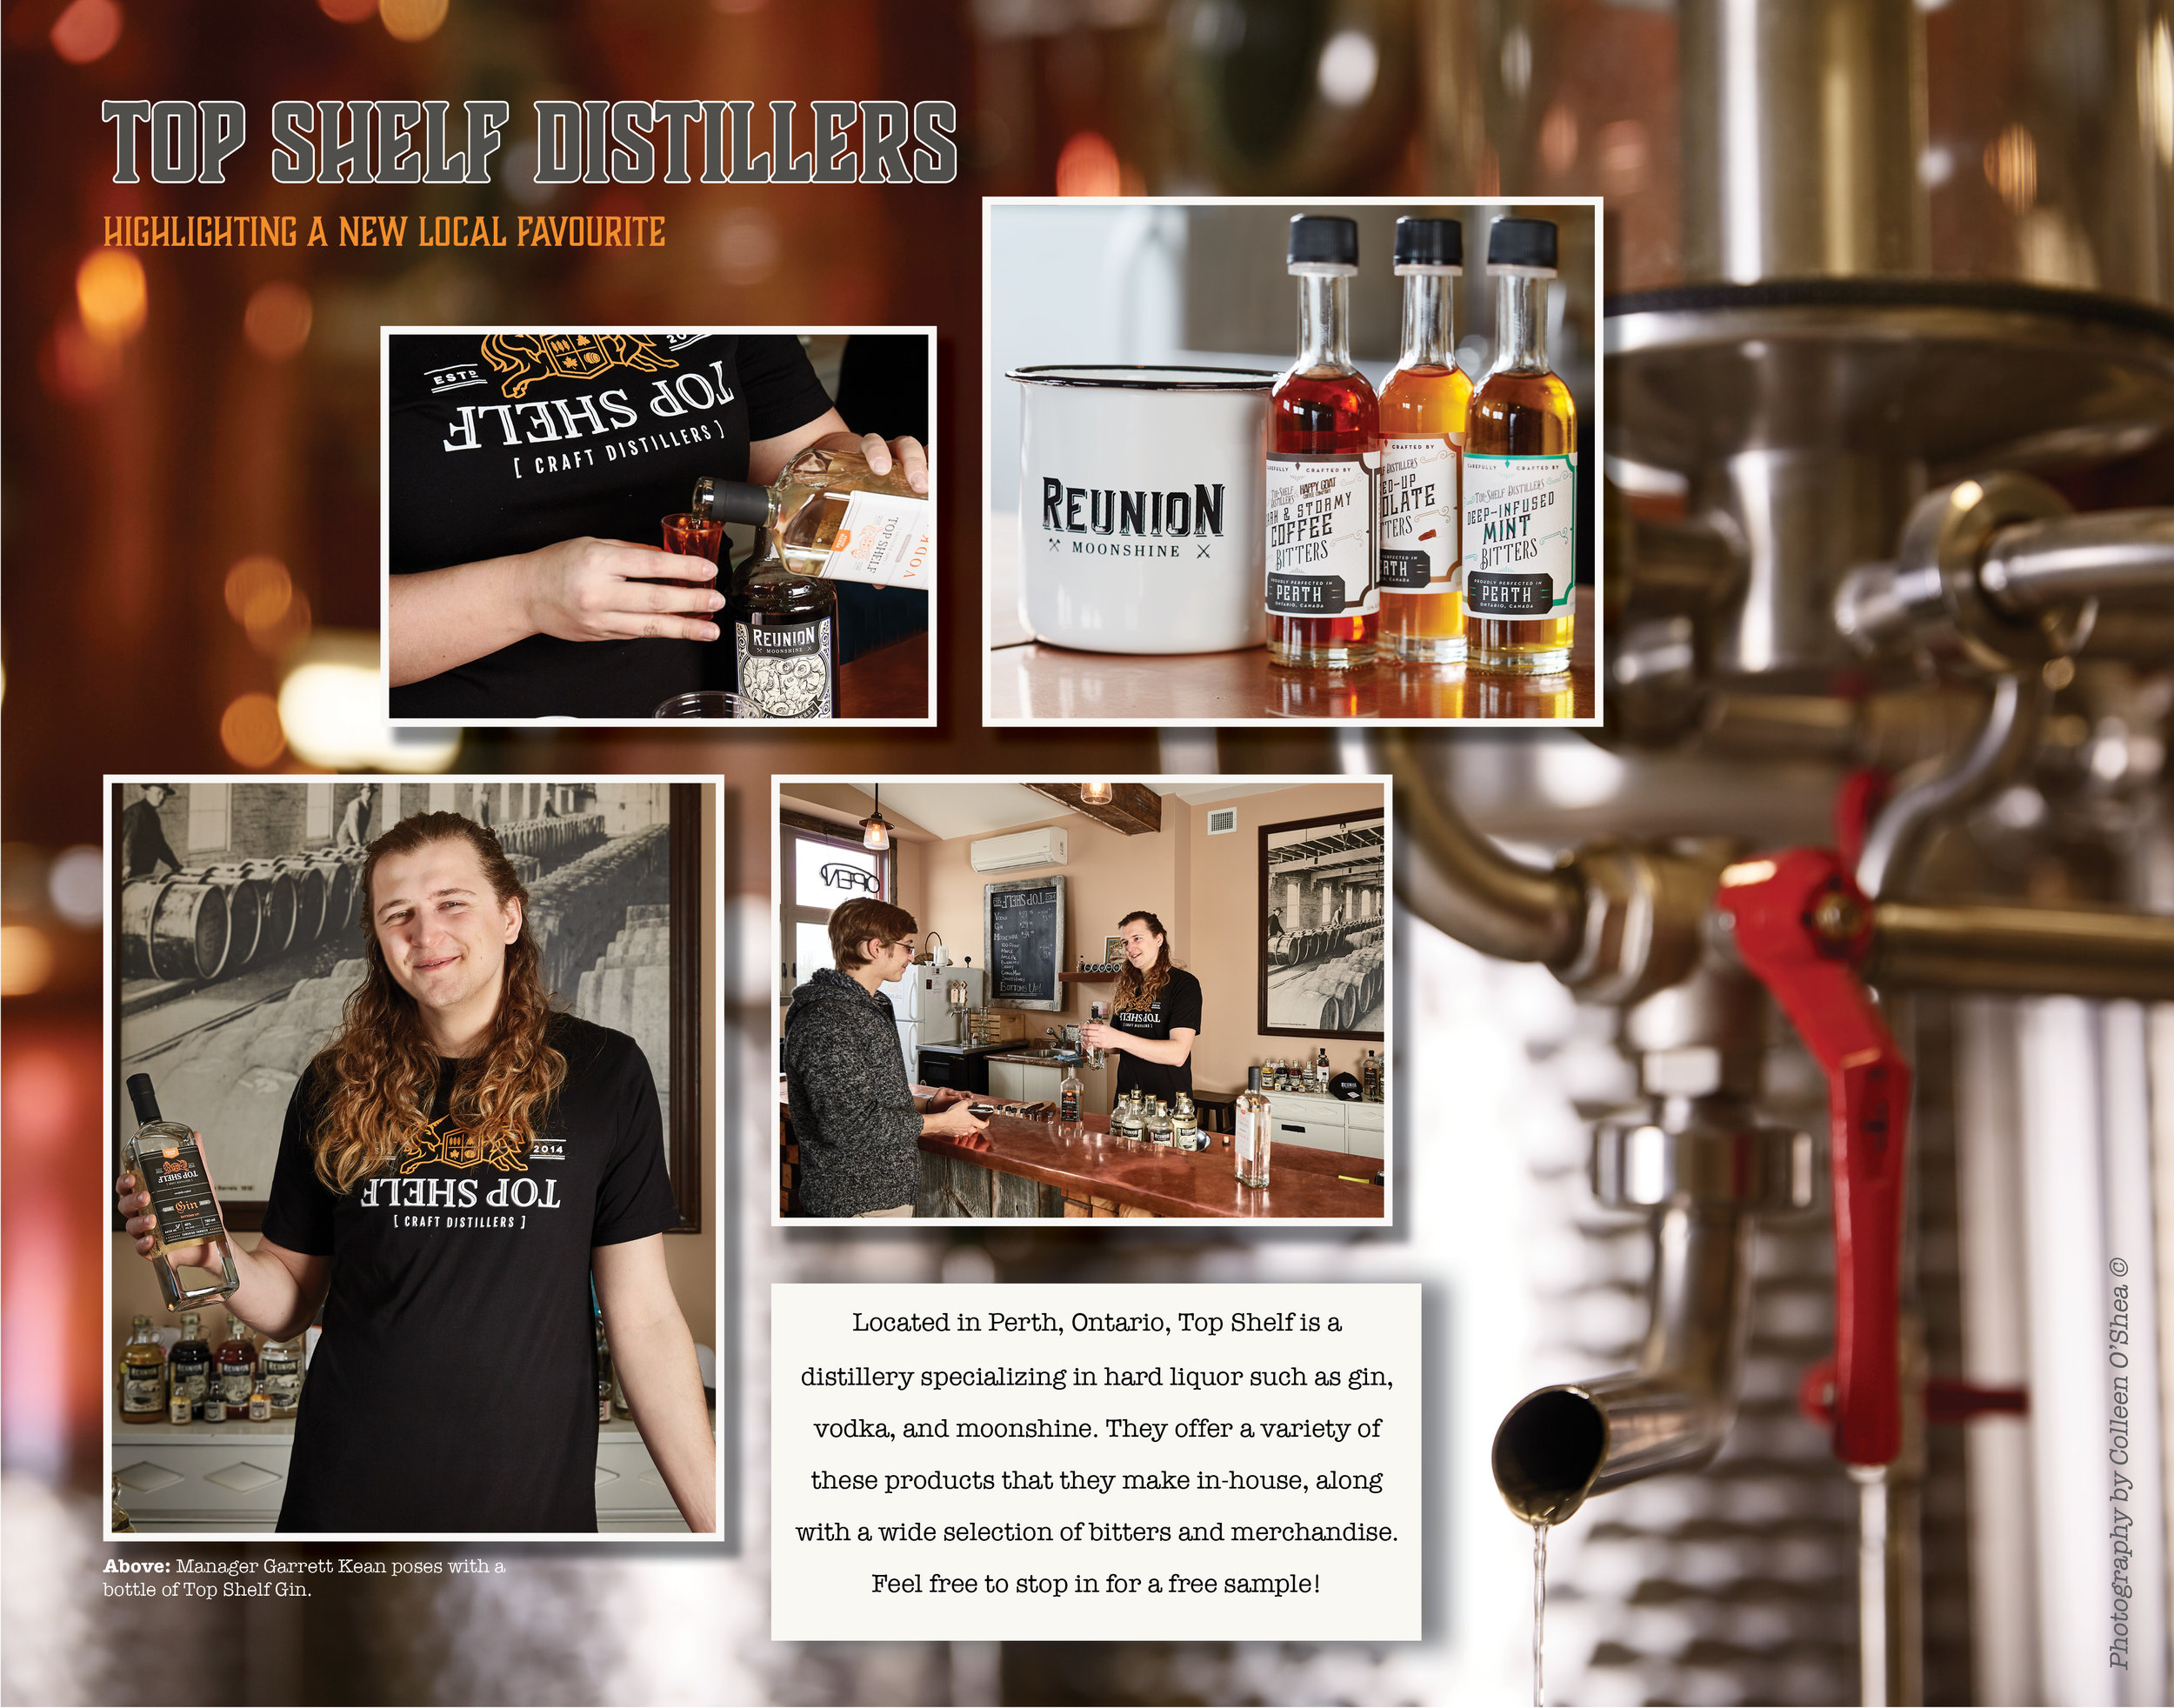 Lifestyle Assignment - Top Shelf Distillers